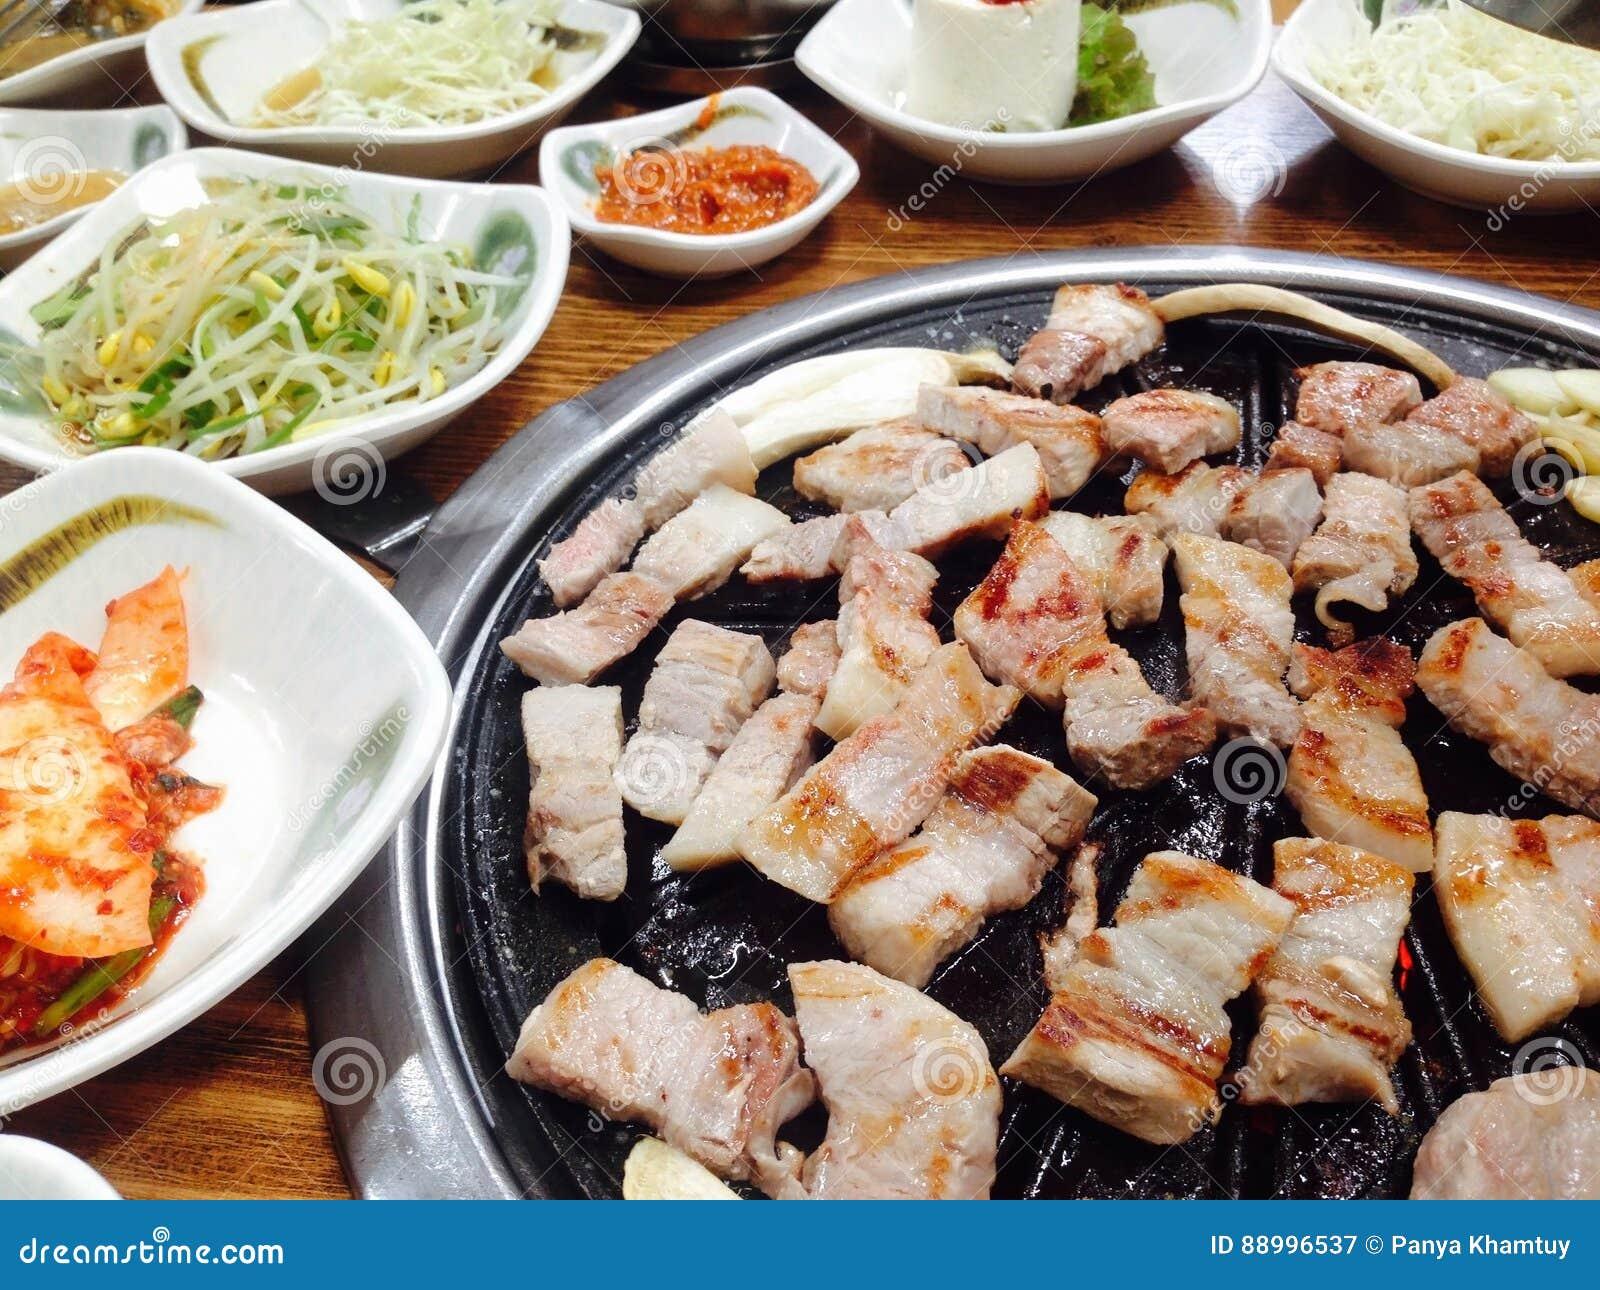 Korean Food Bbq Grilled Pork In The Korean Restaurant South Korea